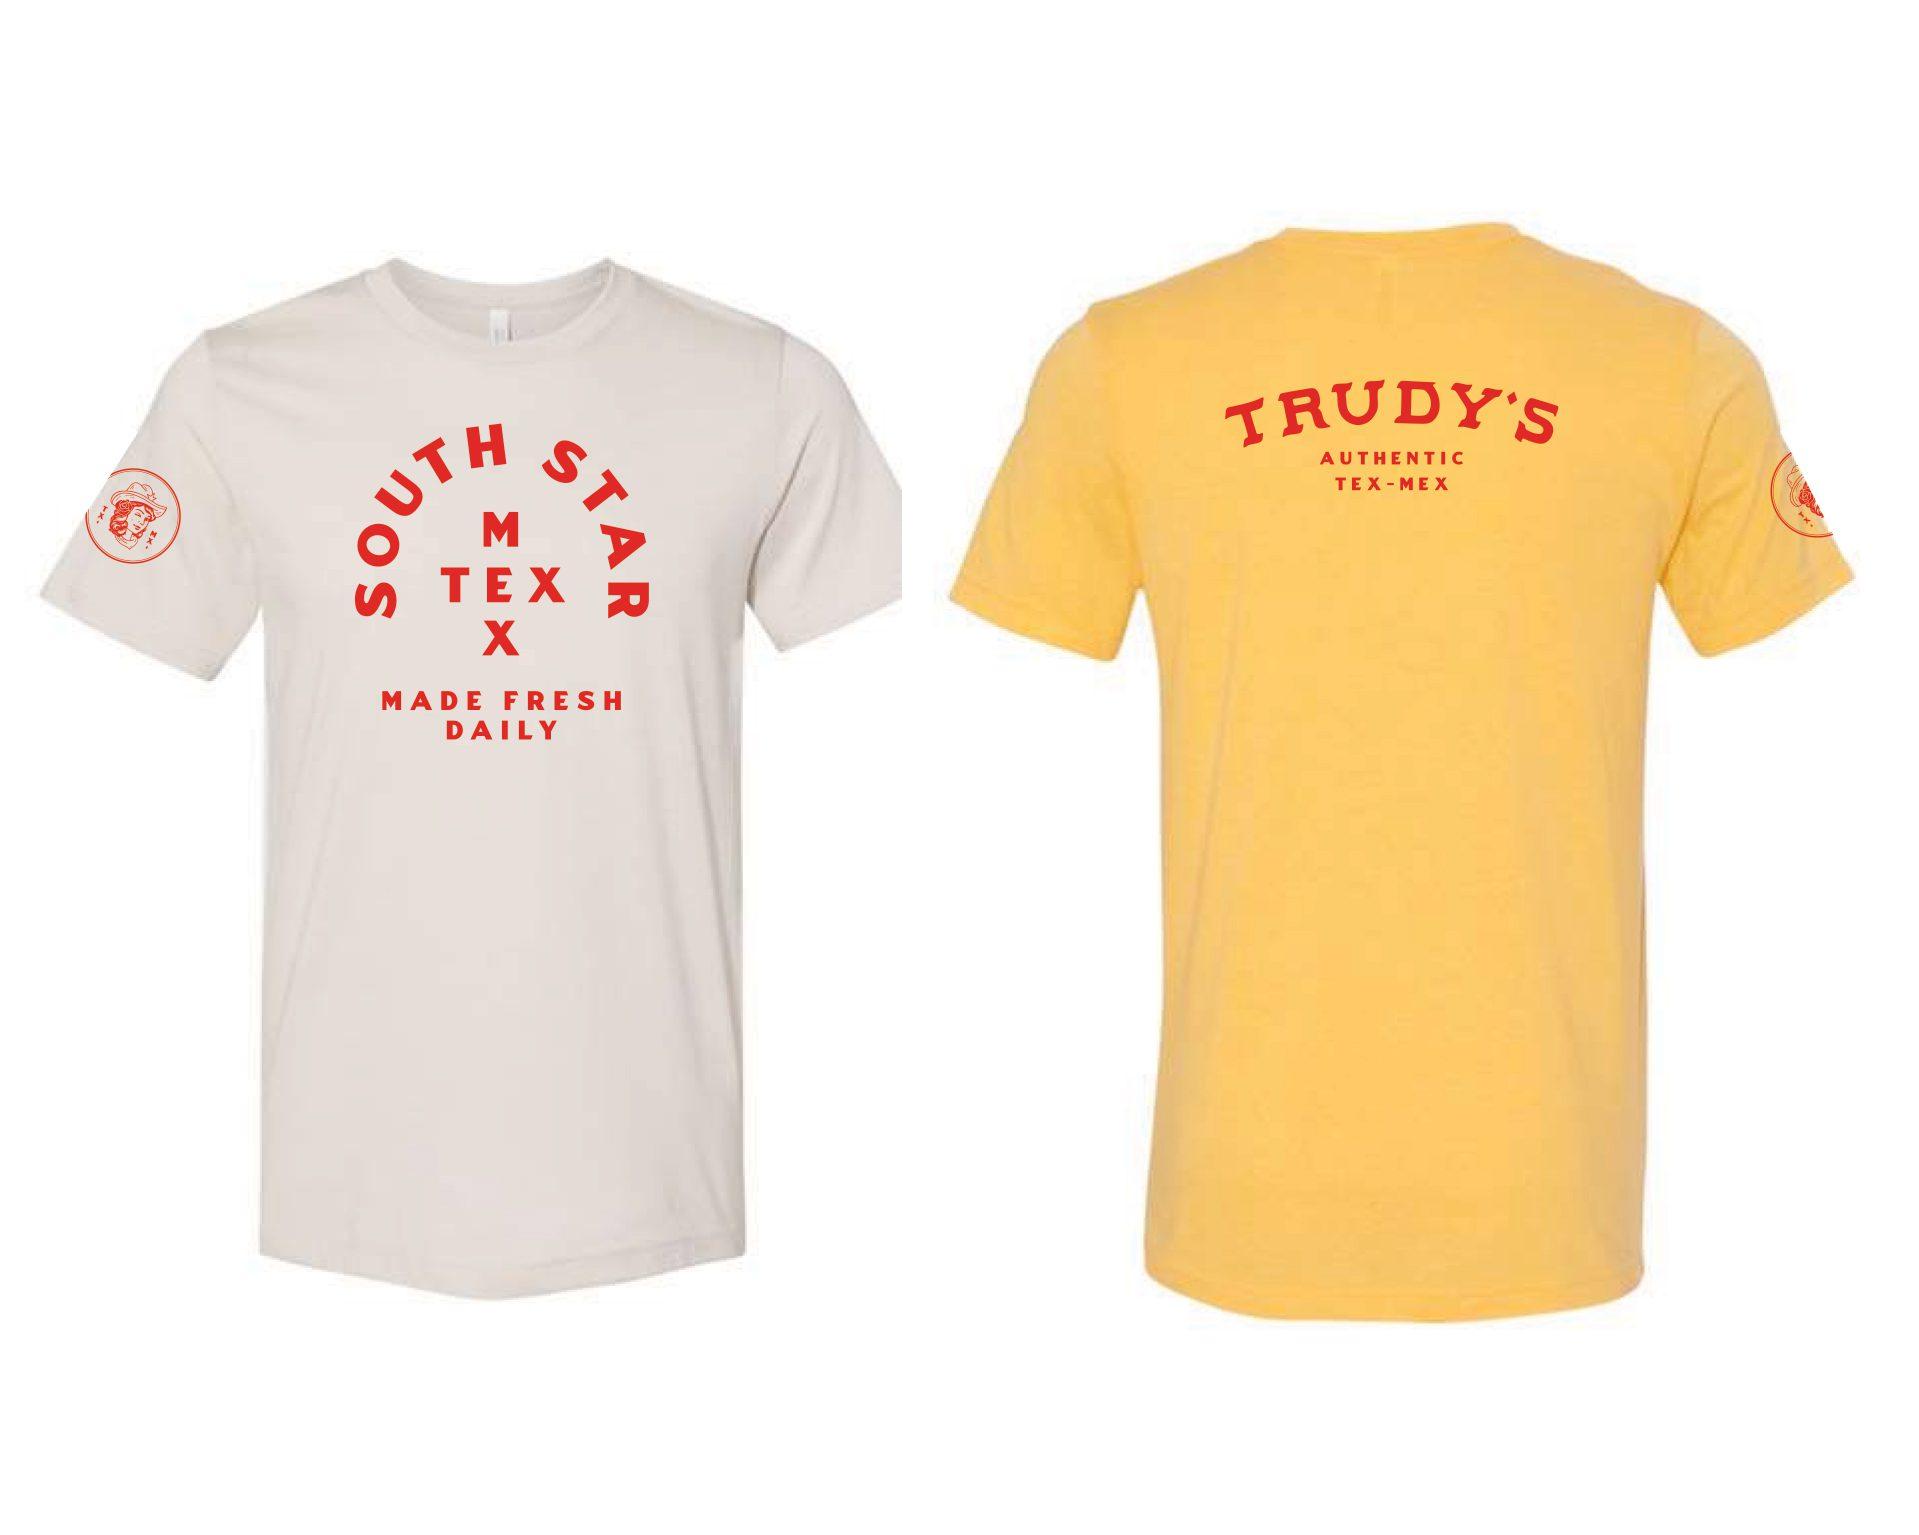 Trudys shirts